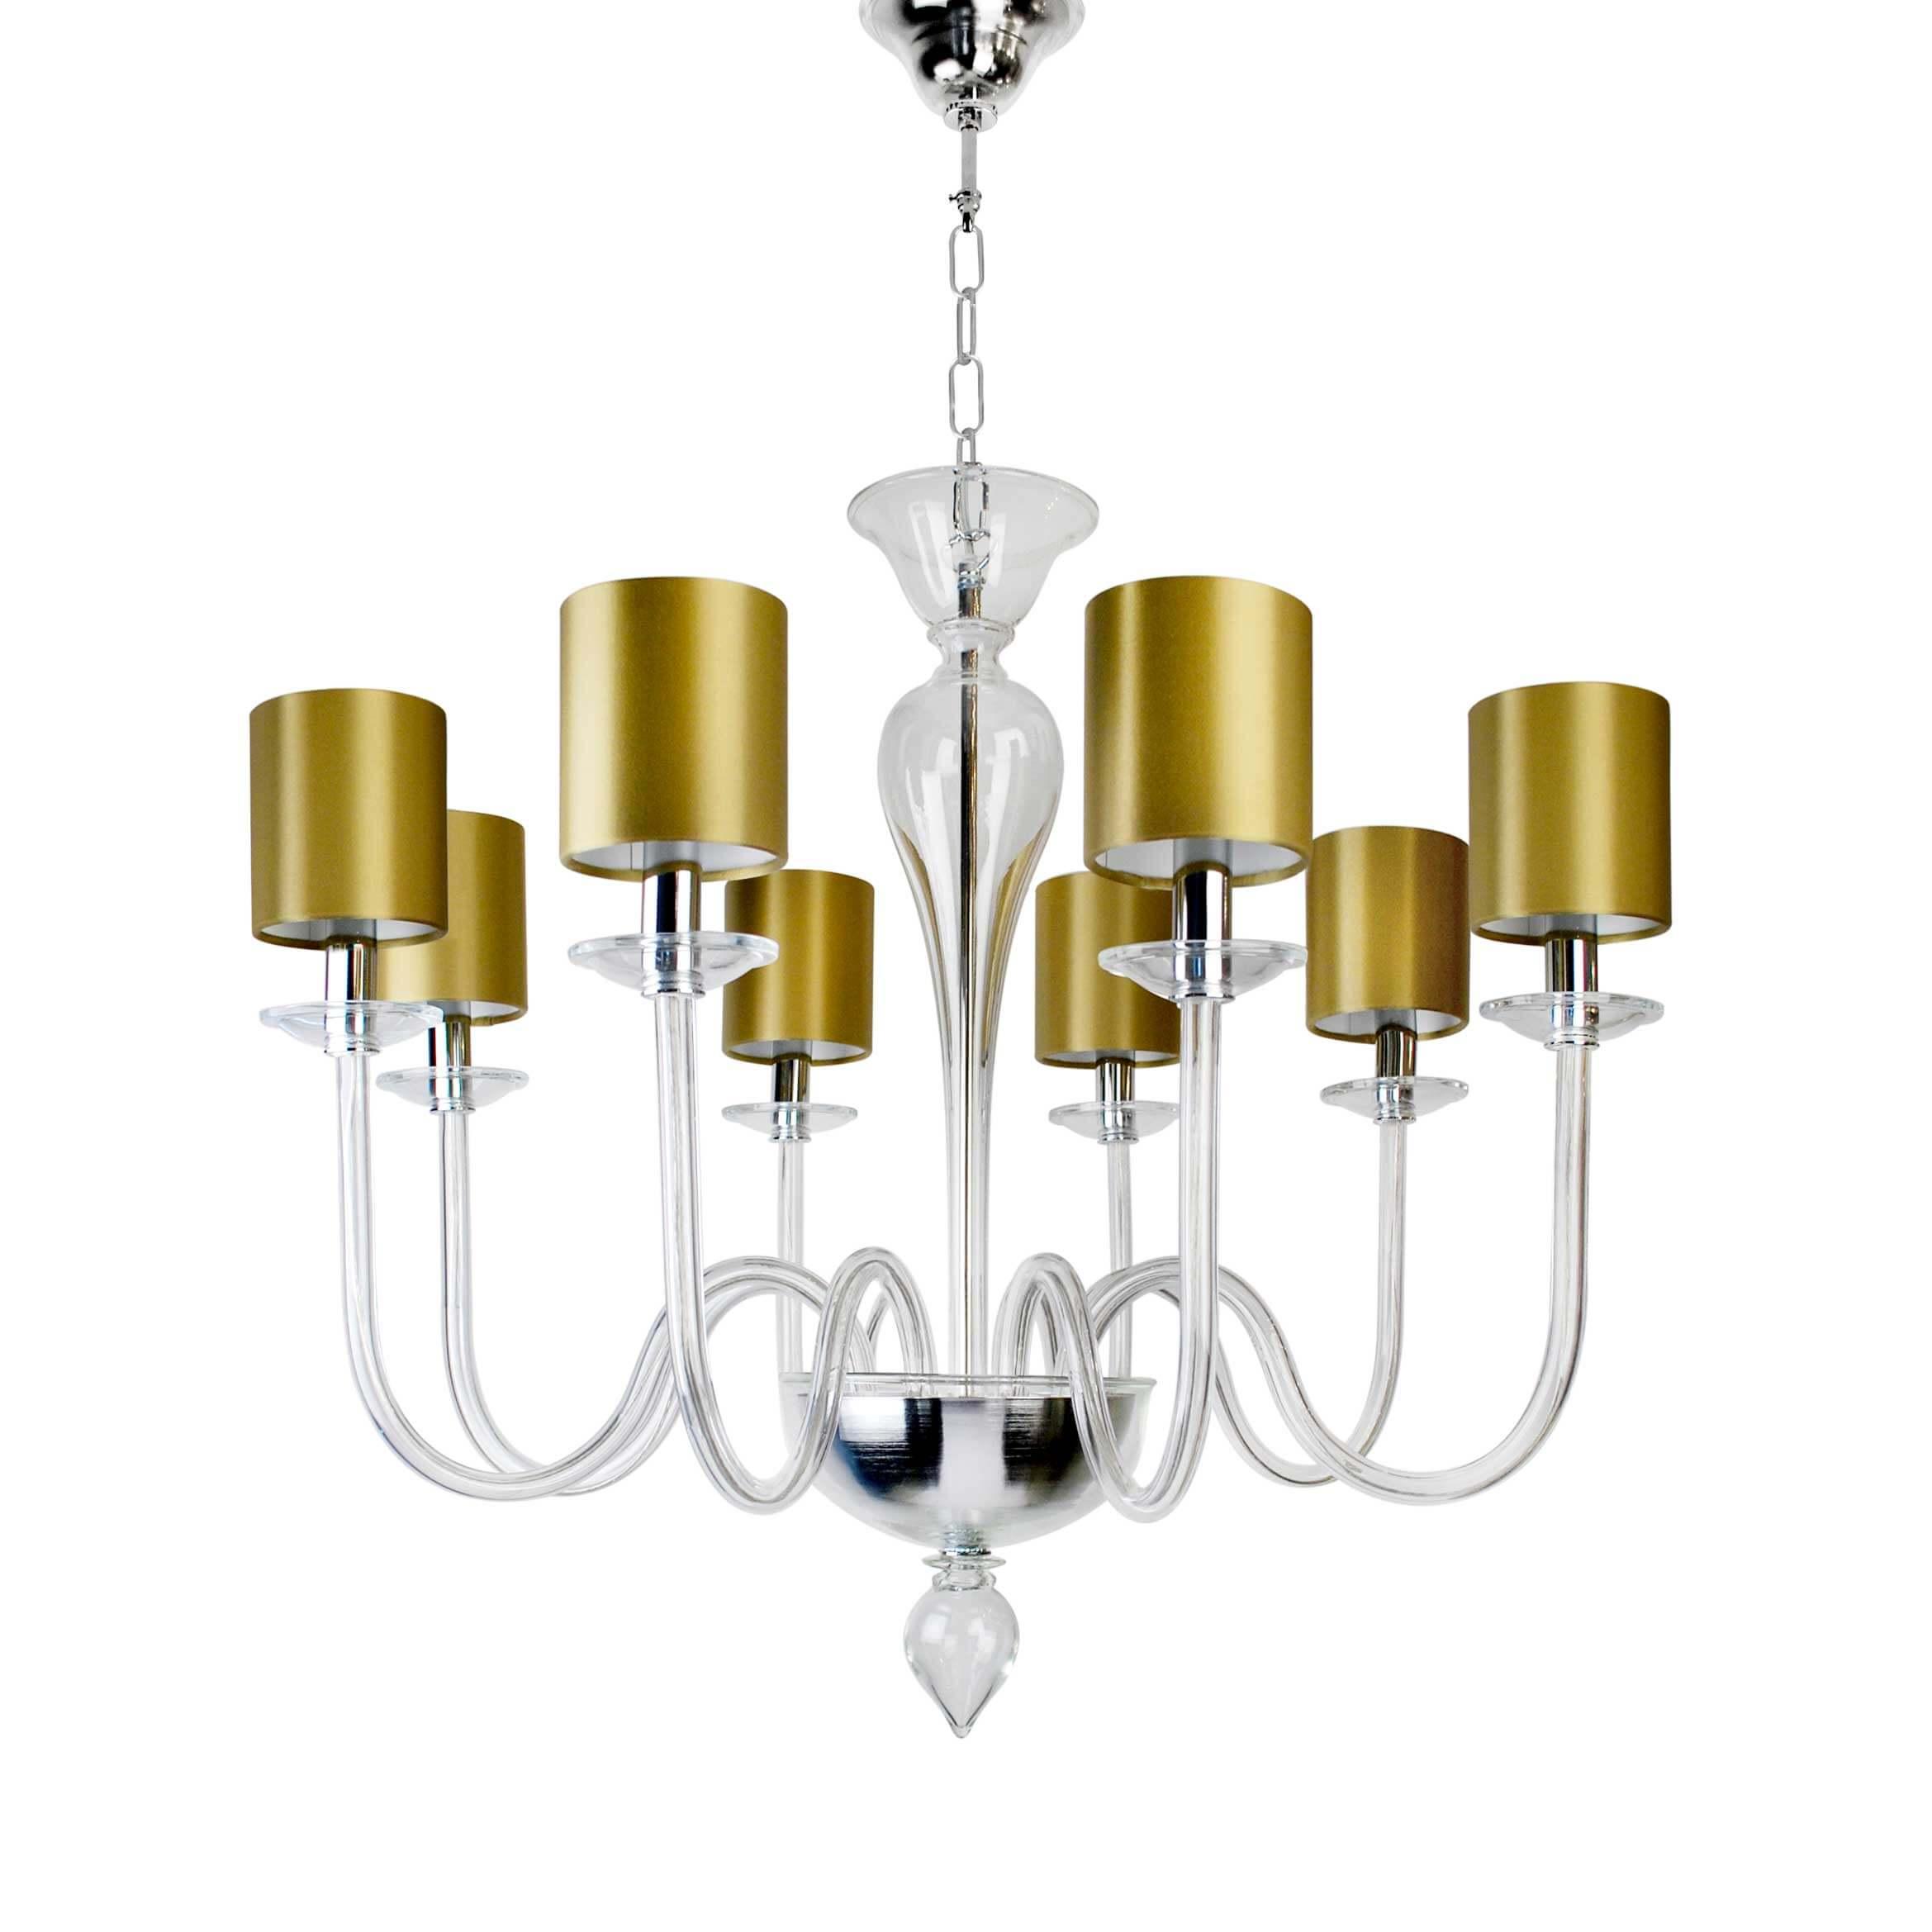 Grace villaverde london villaverde london grace murano chandelier square arubaitofo Images